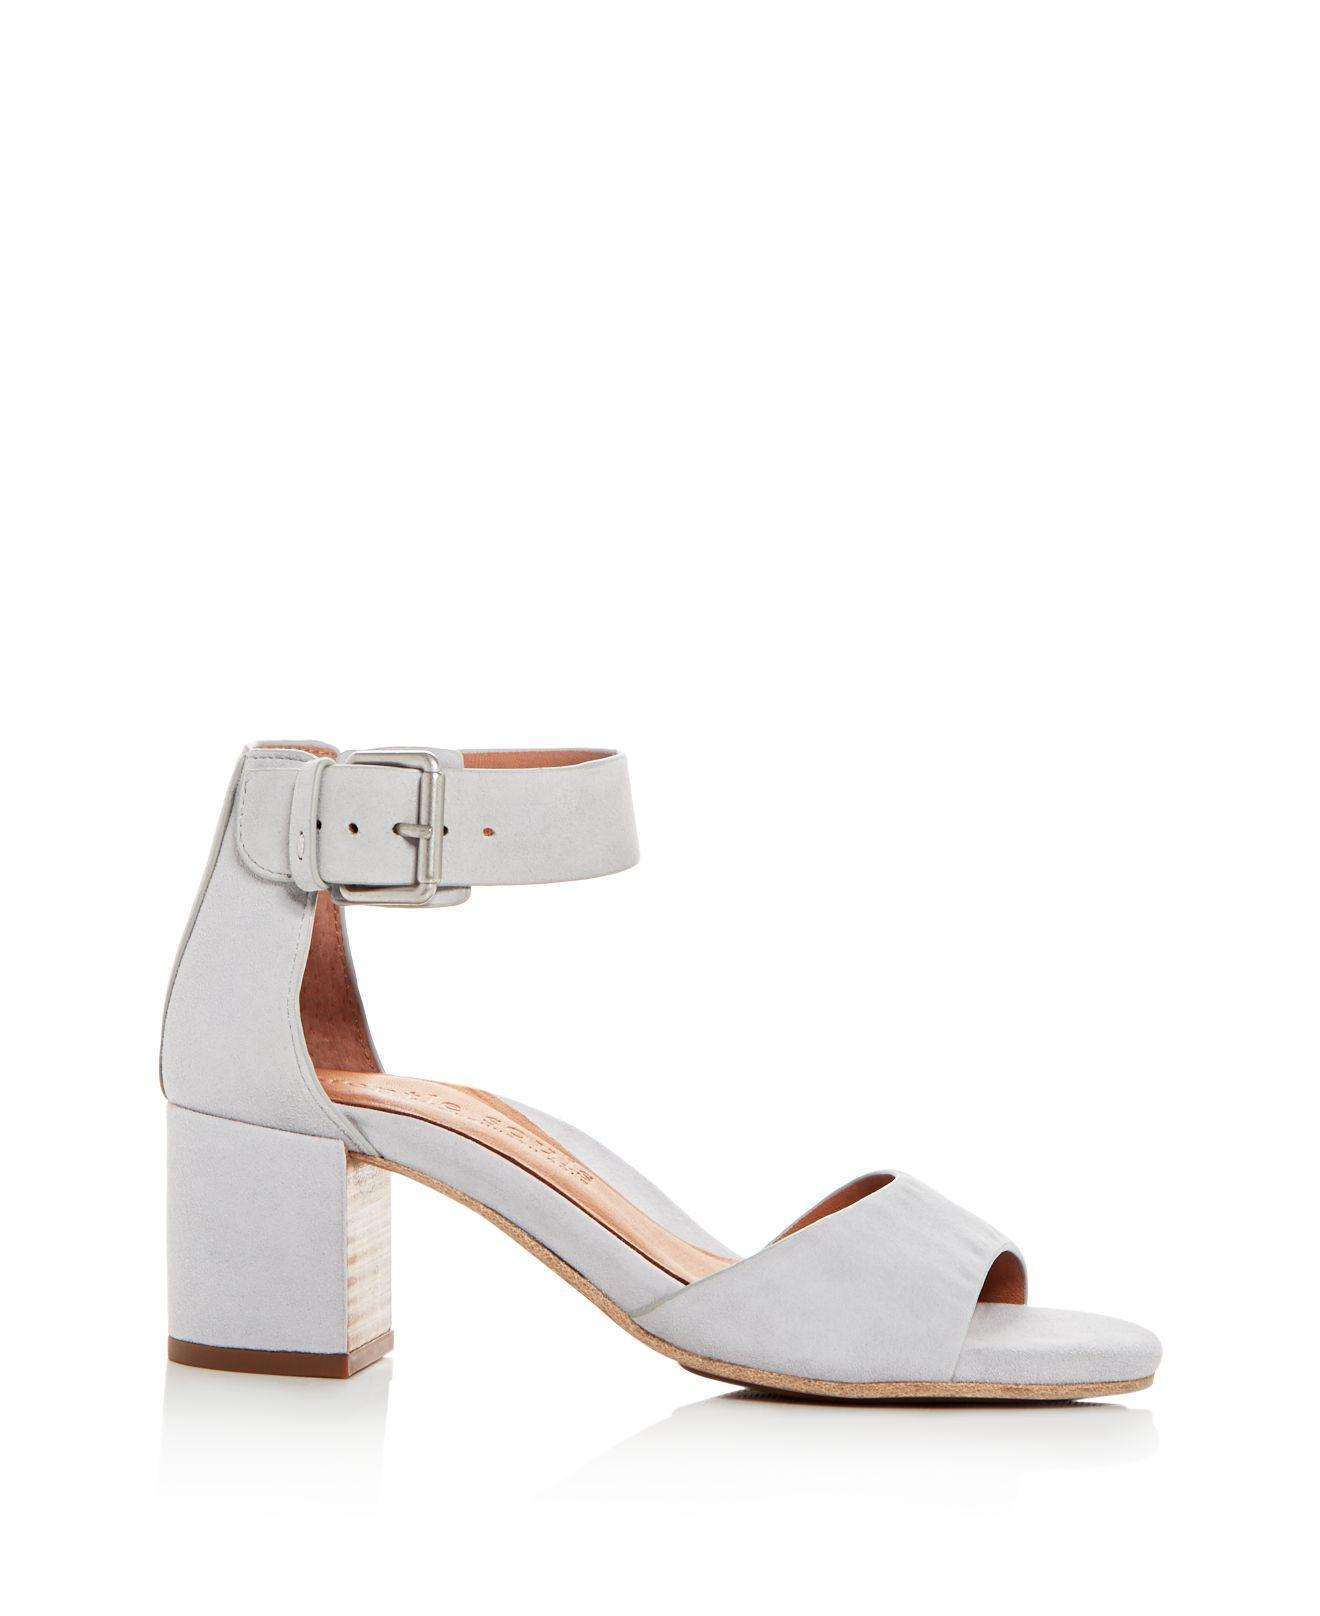 d089b1018b1 Lyst - Gentle Souls Women s Christa Suede Ankle Strap Block Heel Sandals